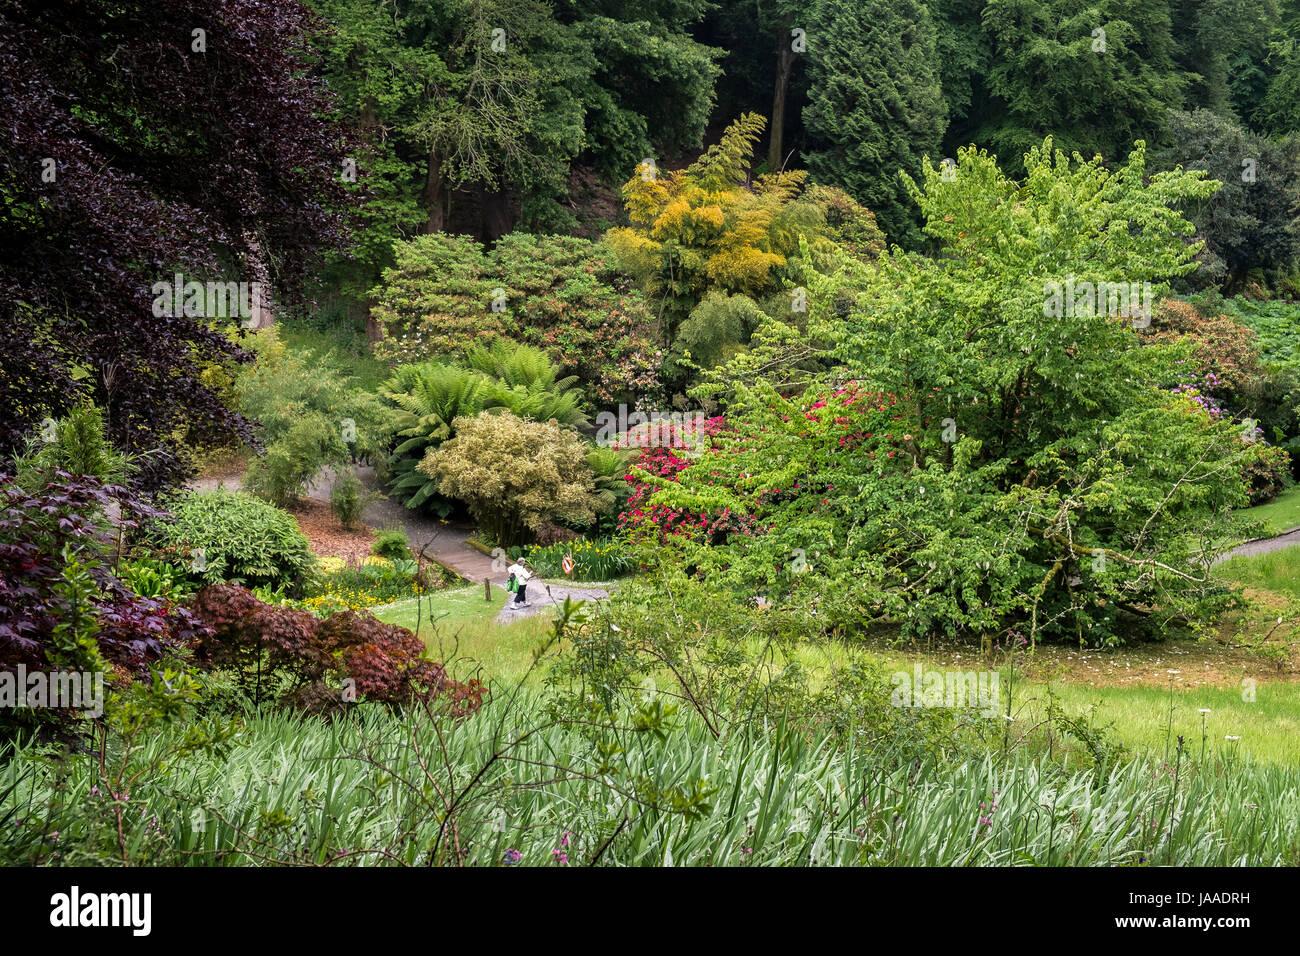 Laub in den subtropischen Trebah Garten in Cornwall. Stockbild